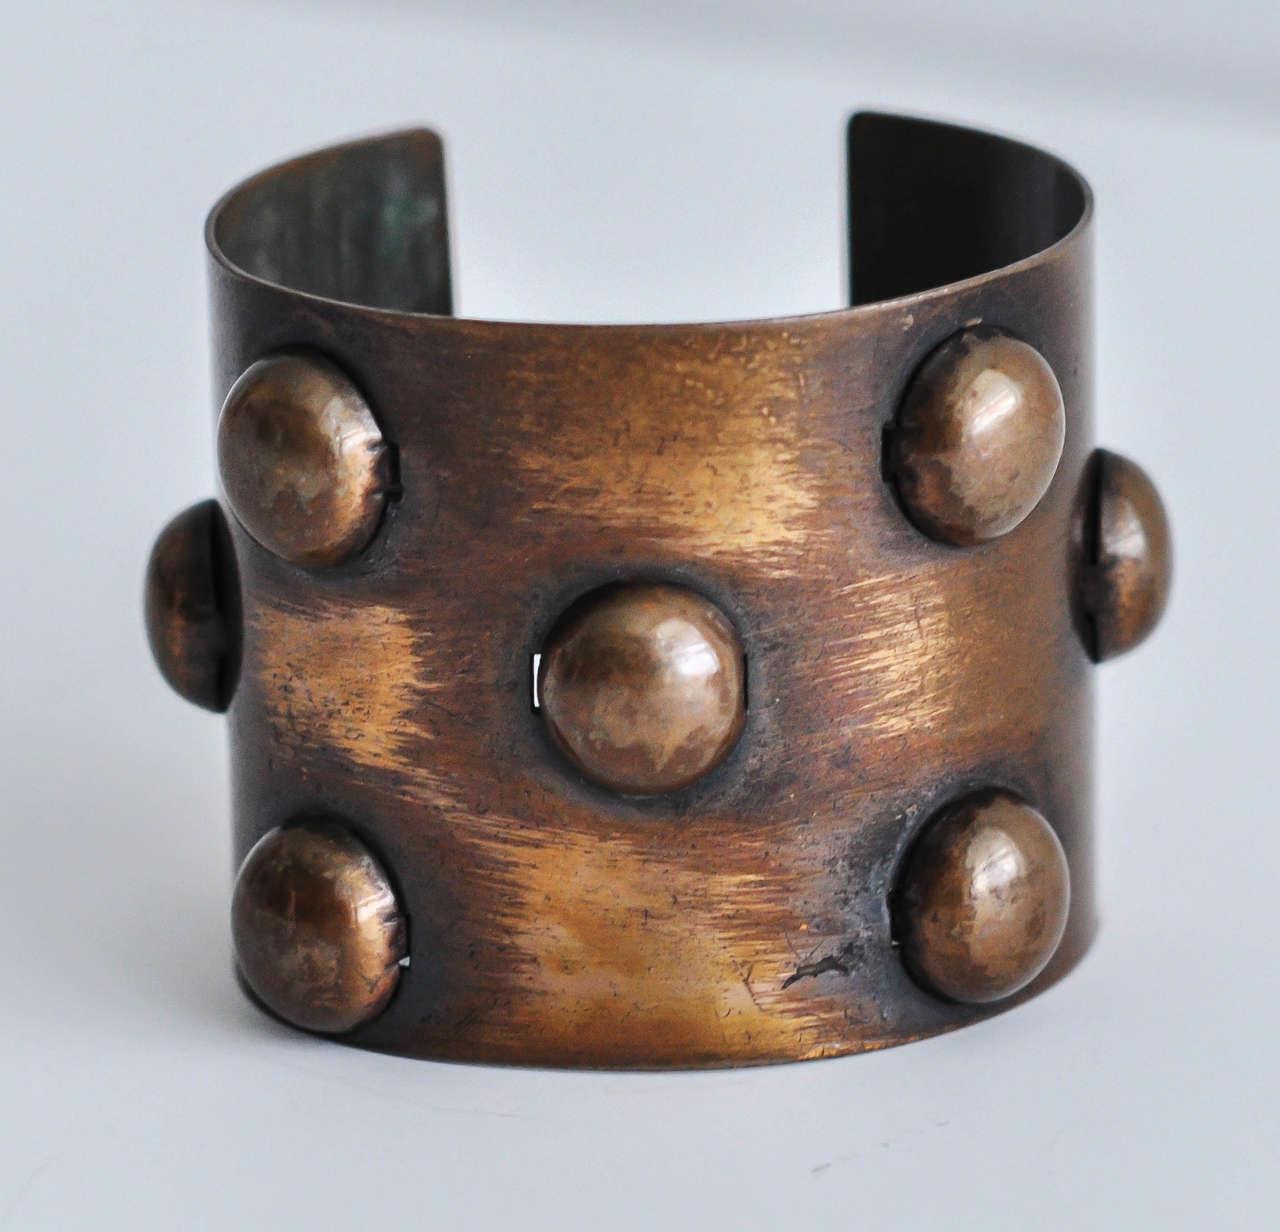 1950s Rebajes Geometric Copper Cuff For Sale 3